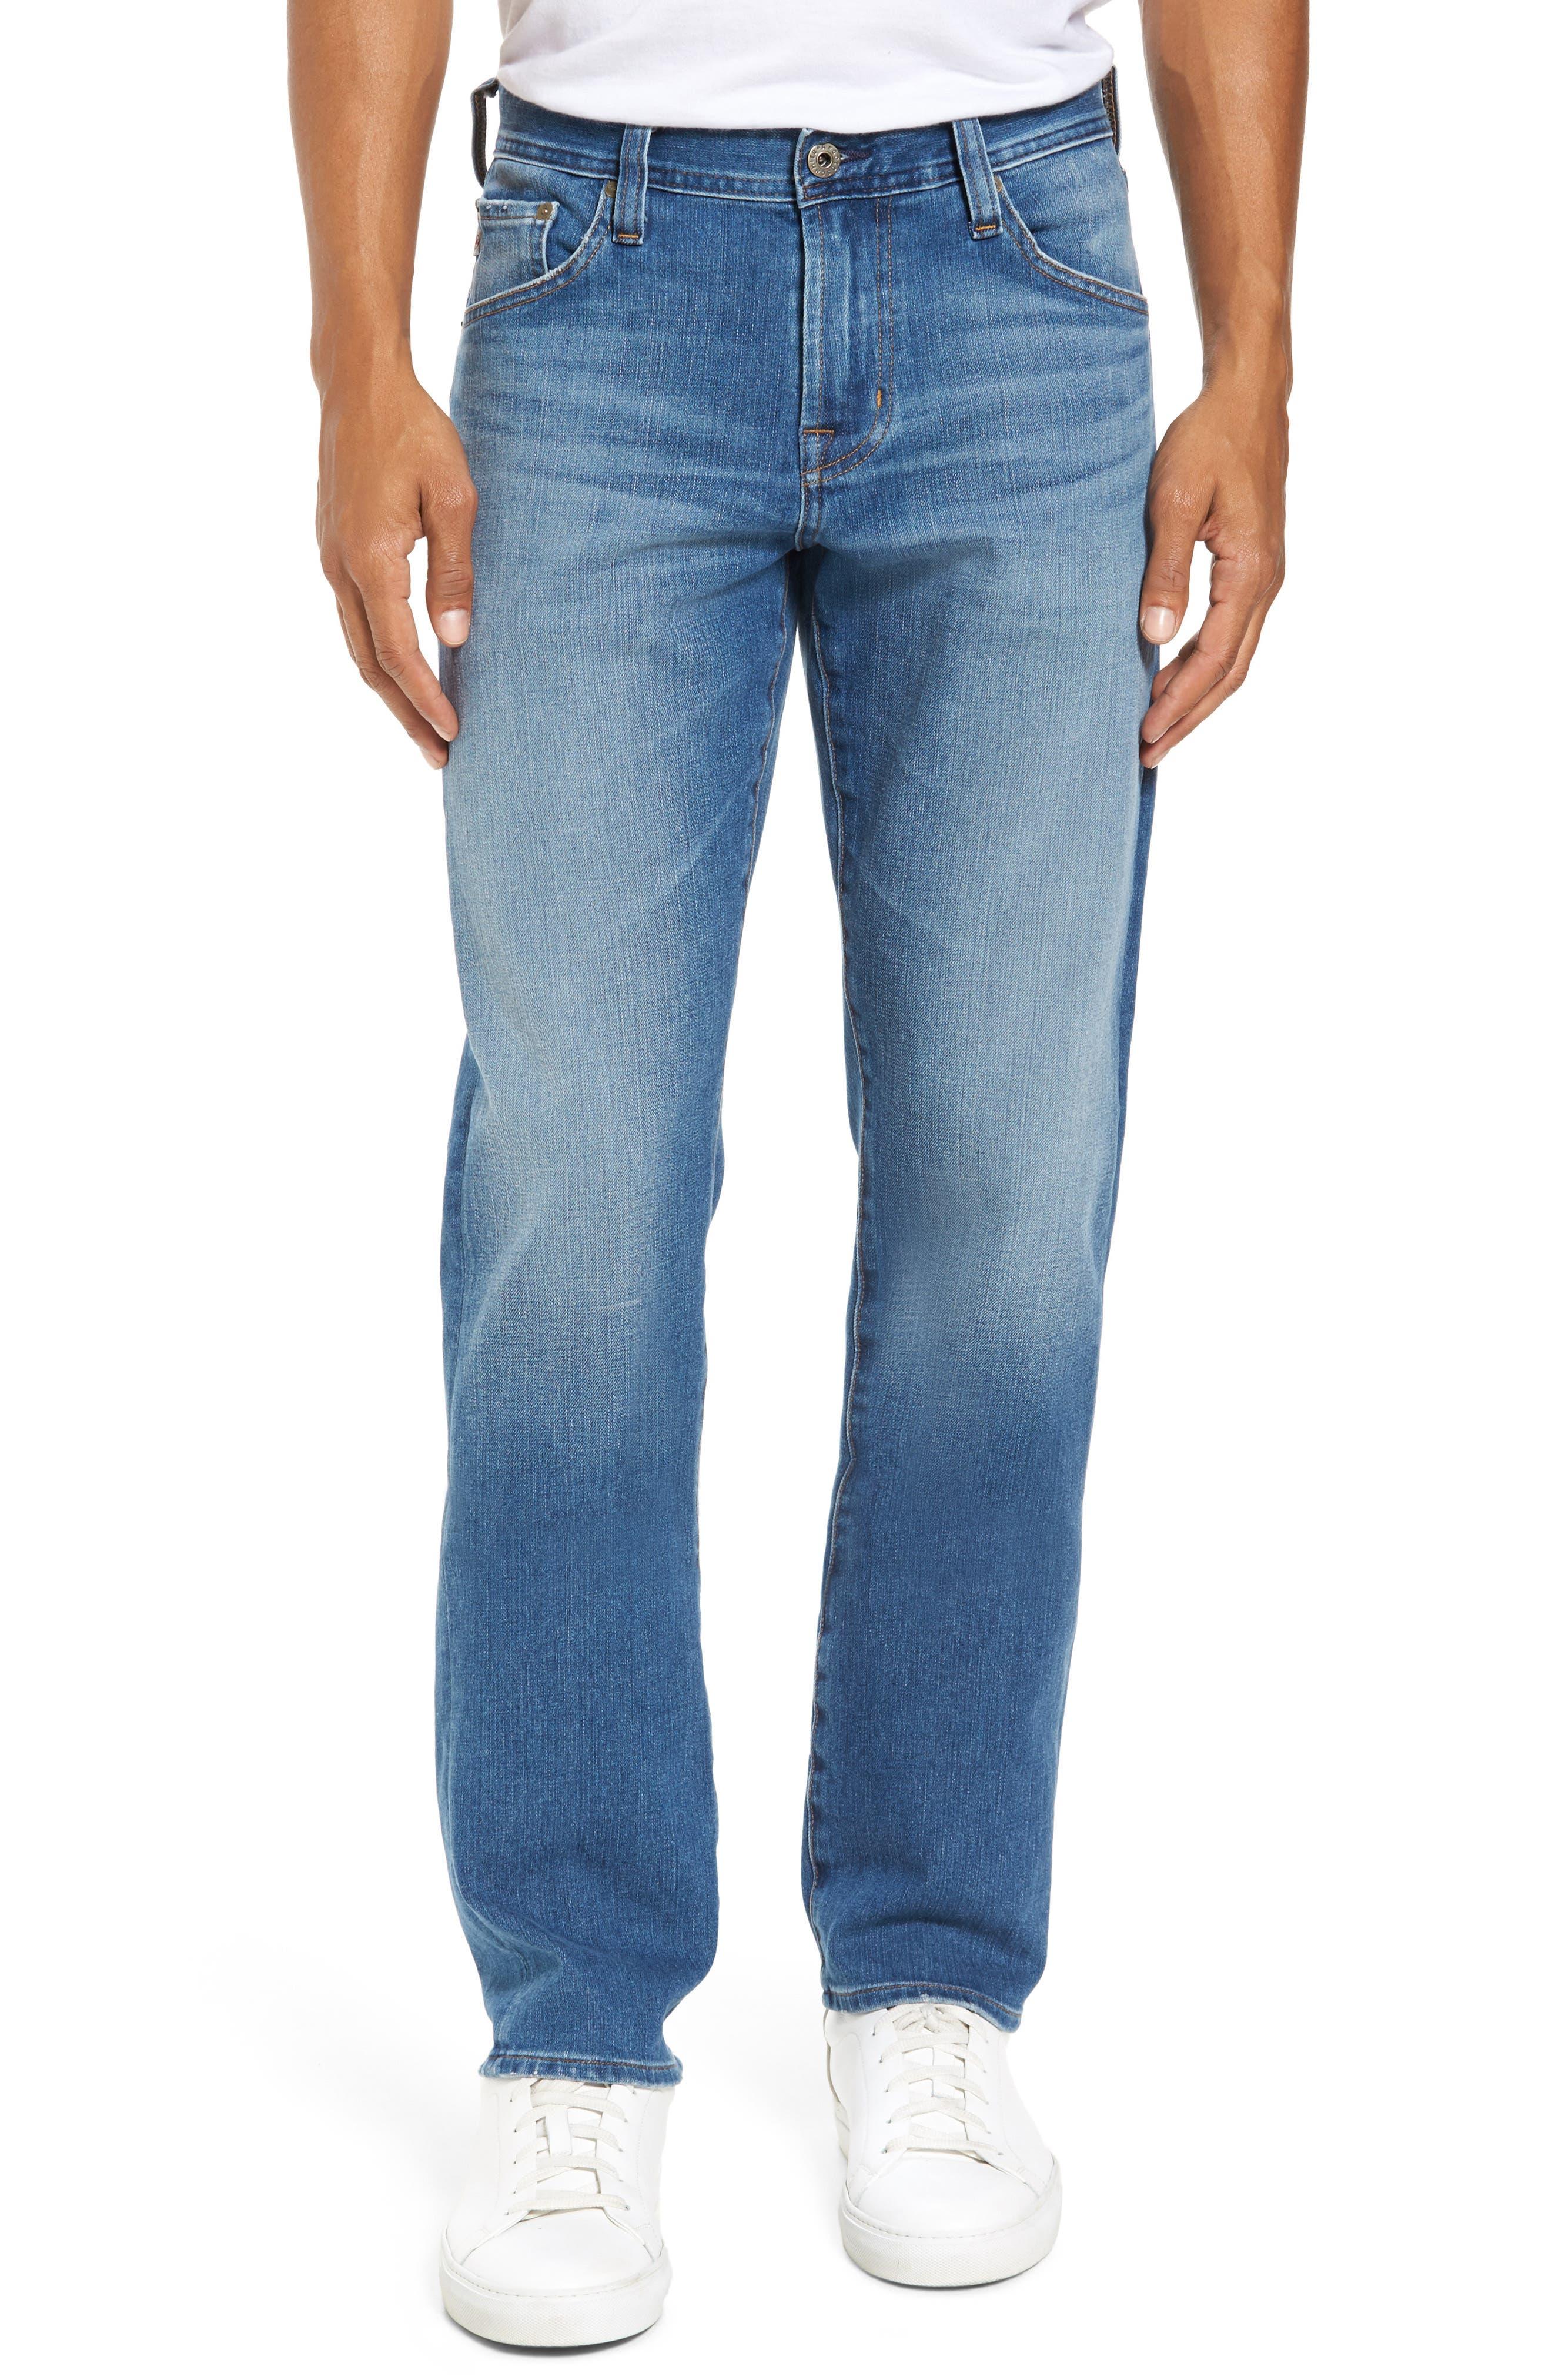 Graduate Slim Straight Fit Jeans,                         Main,                         color, Audition